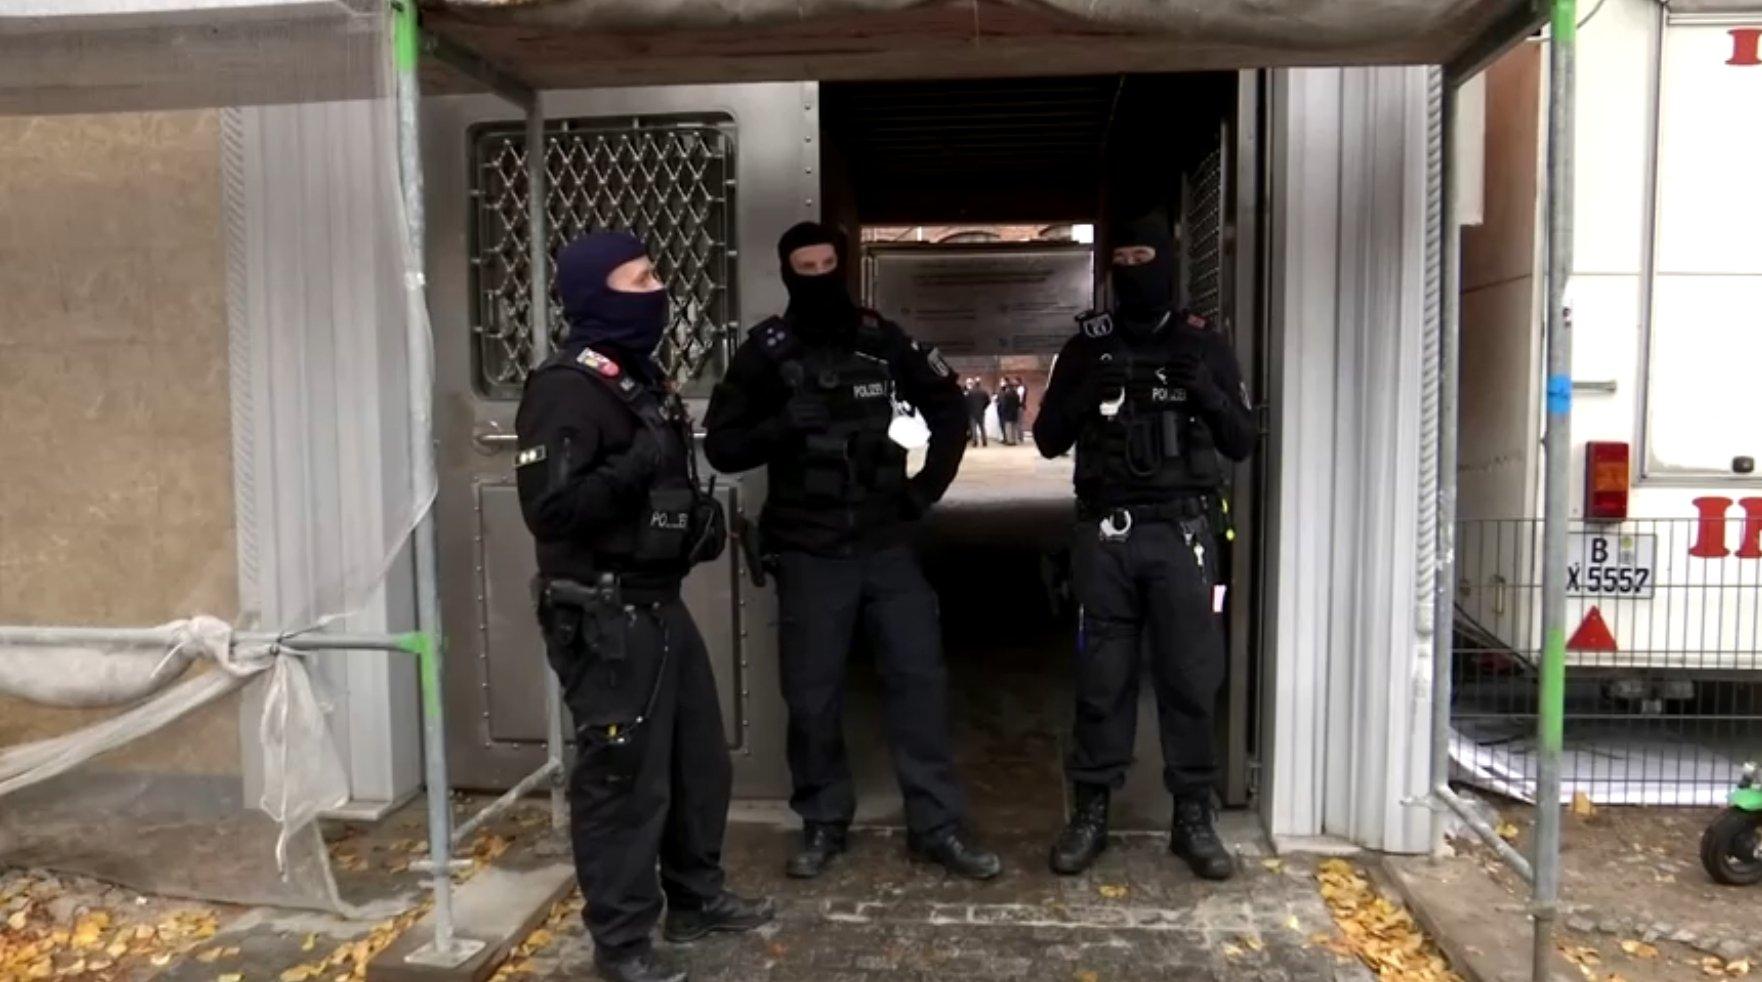 Turkey condemns police storming of Berlin mosque